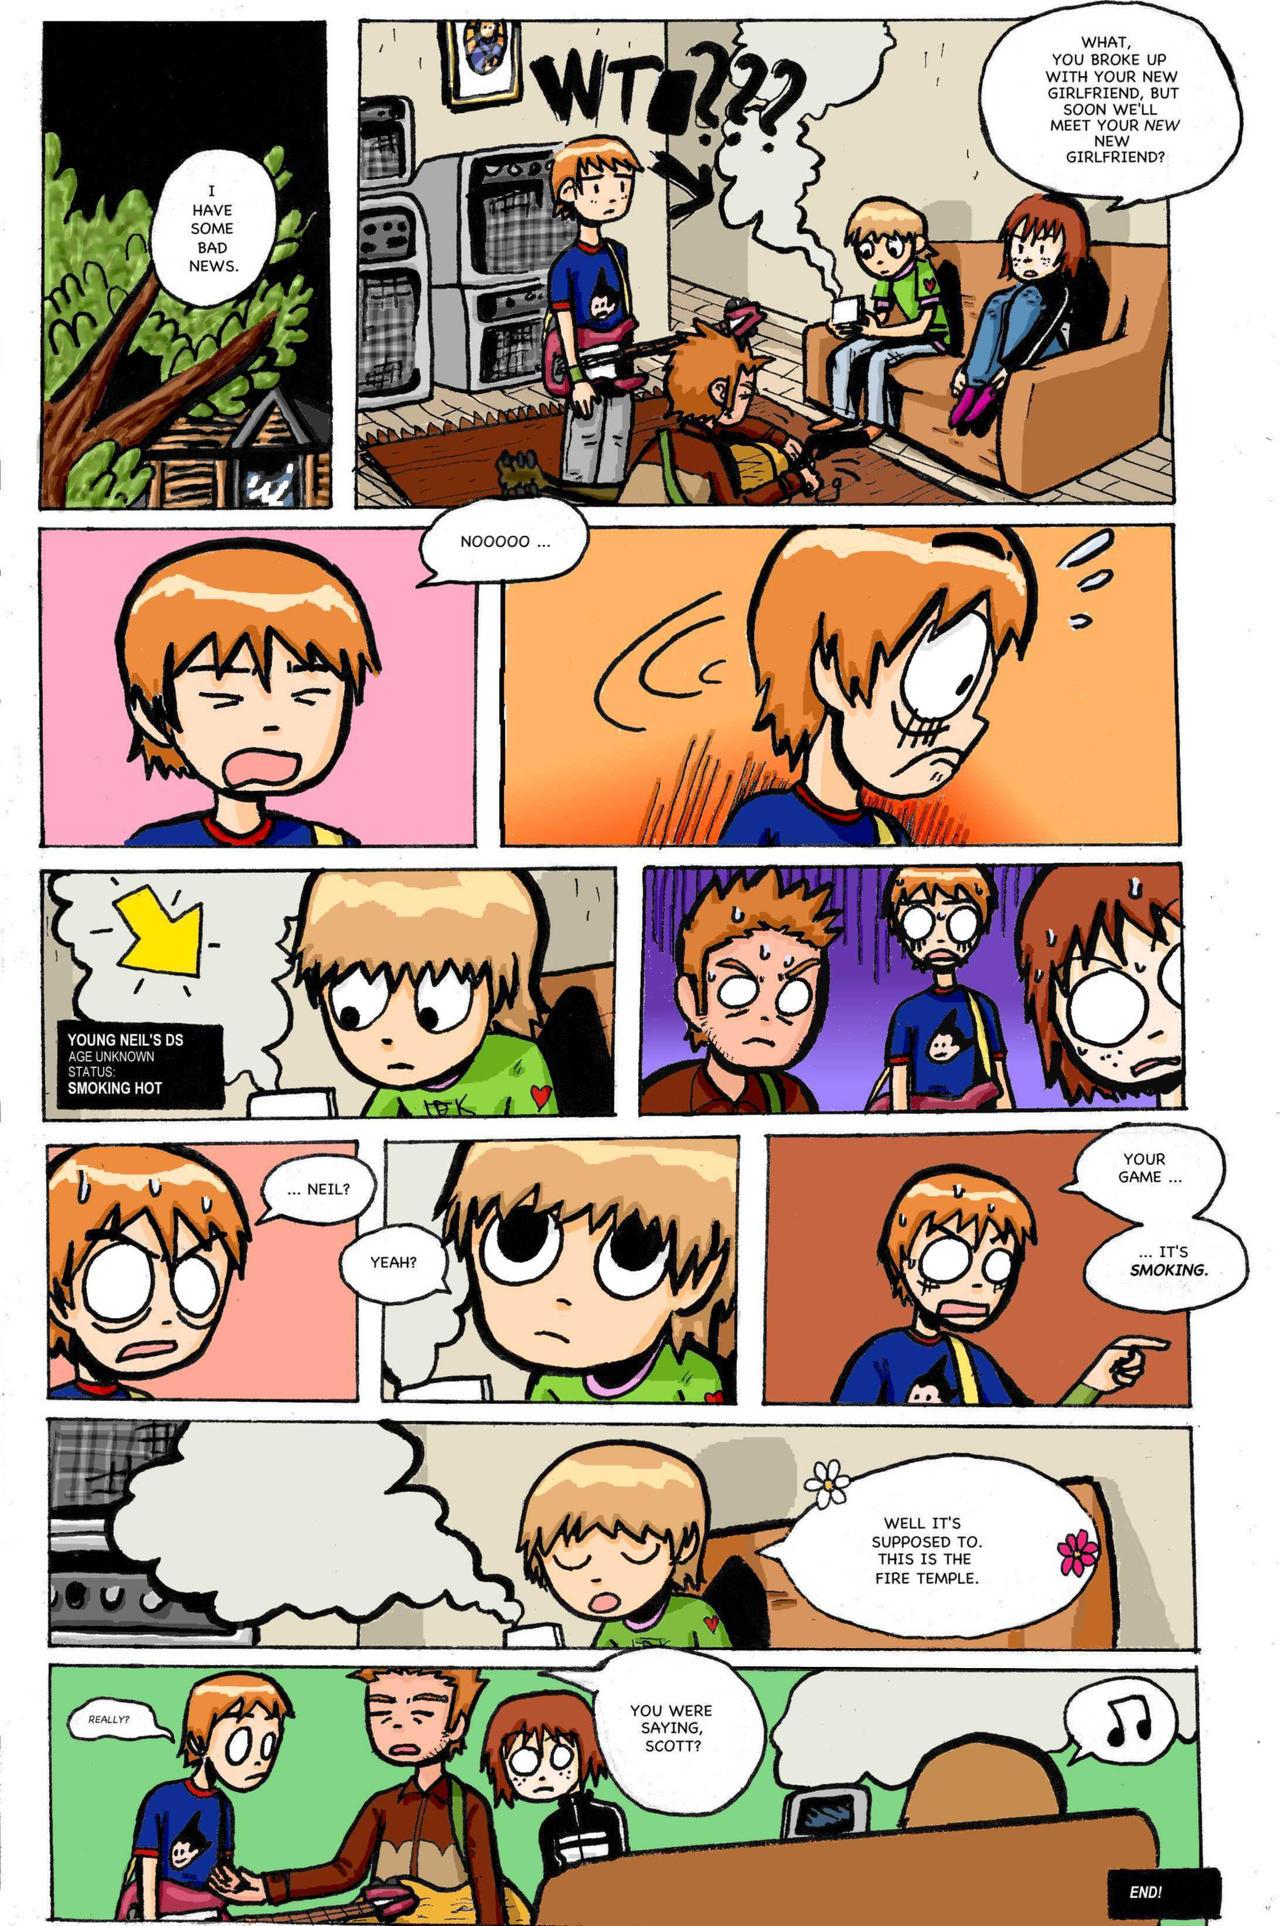 Comic Strips or Pages on Scott-Pilgrim-PLFC - DeviantArt